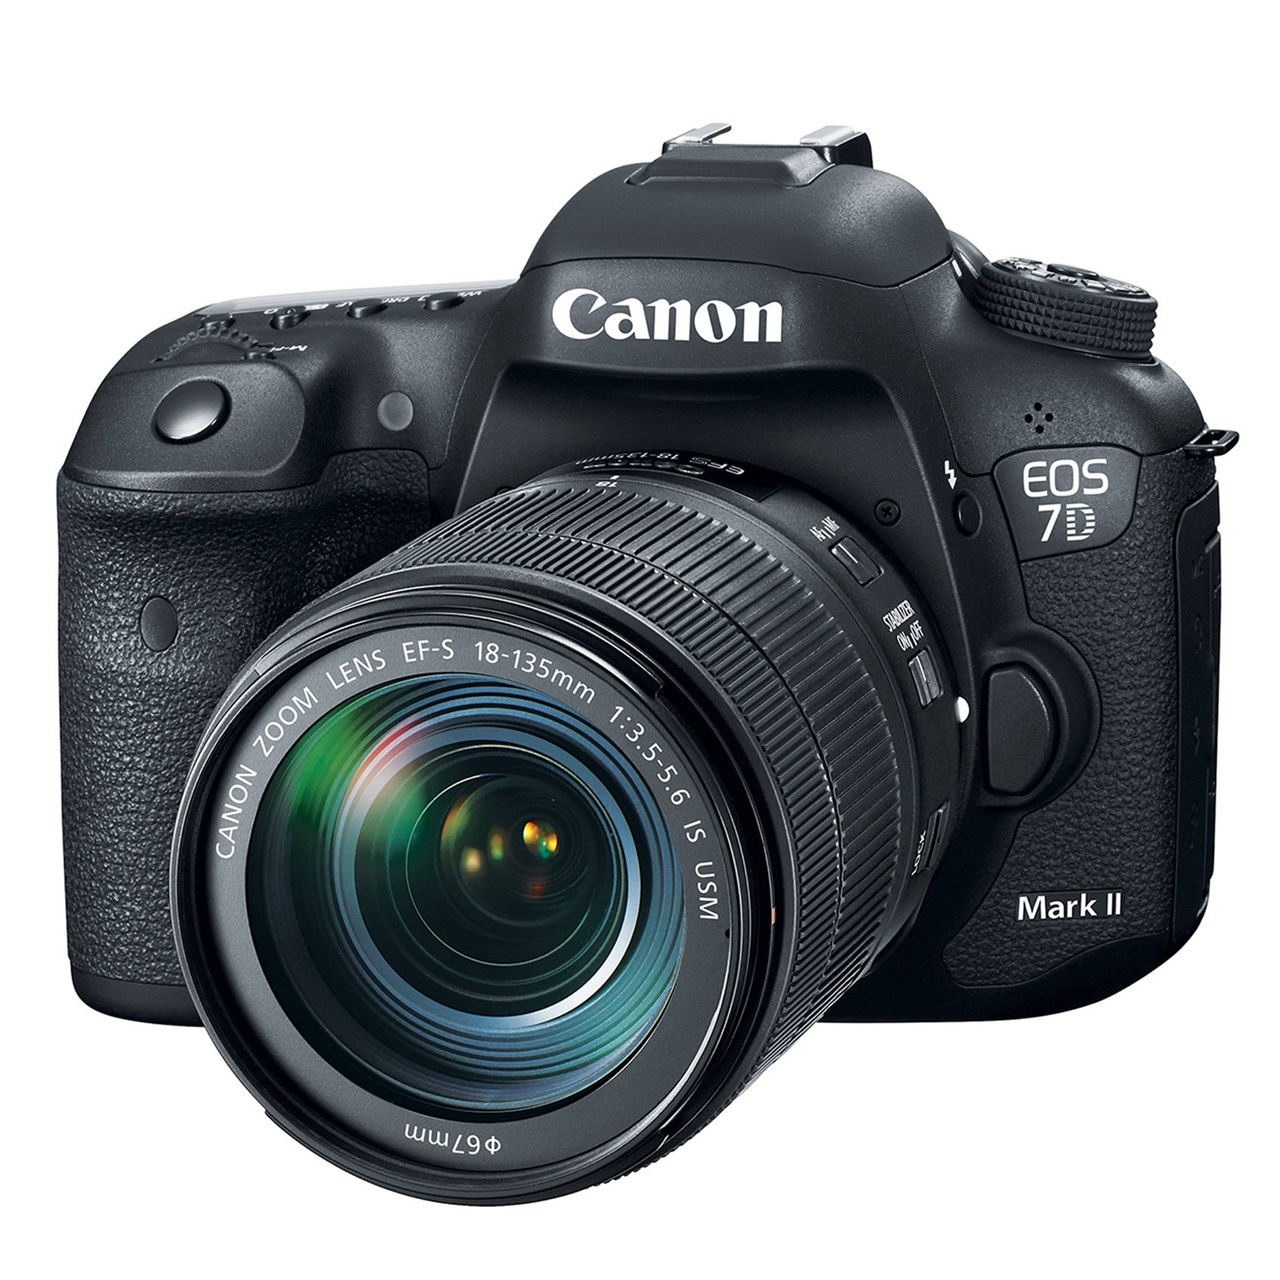 فروش نقدی و اقساطی دوربین دیجیتال کانن مدل EOS 7D Mark II به همراه لنز 18-135 میلی متر IS USM